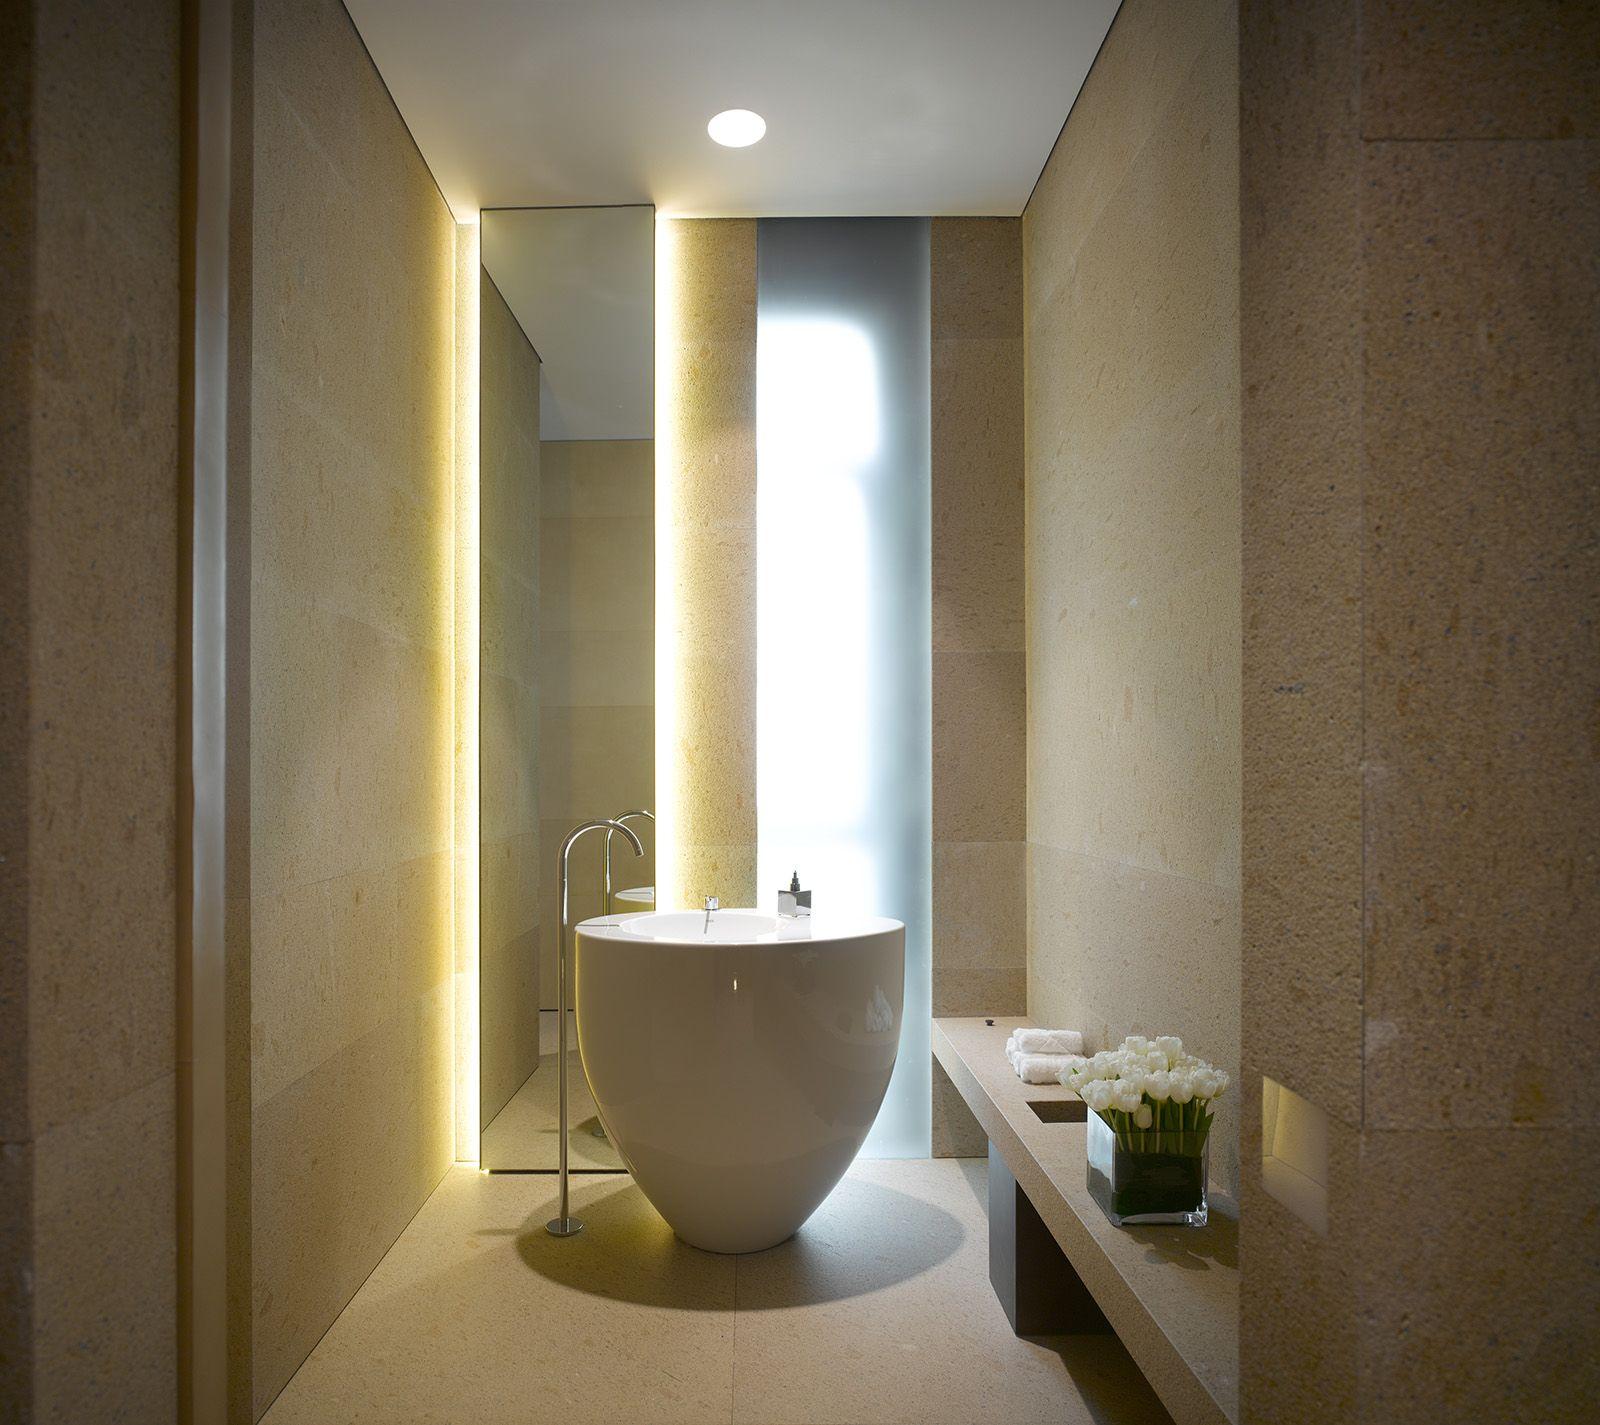 29 Disenos Banos Visitas Elegantes 21: CSA - Claudio Silvestrin Architects